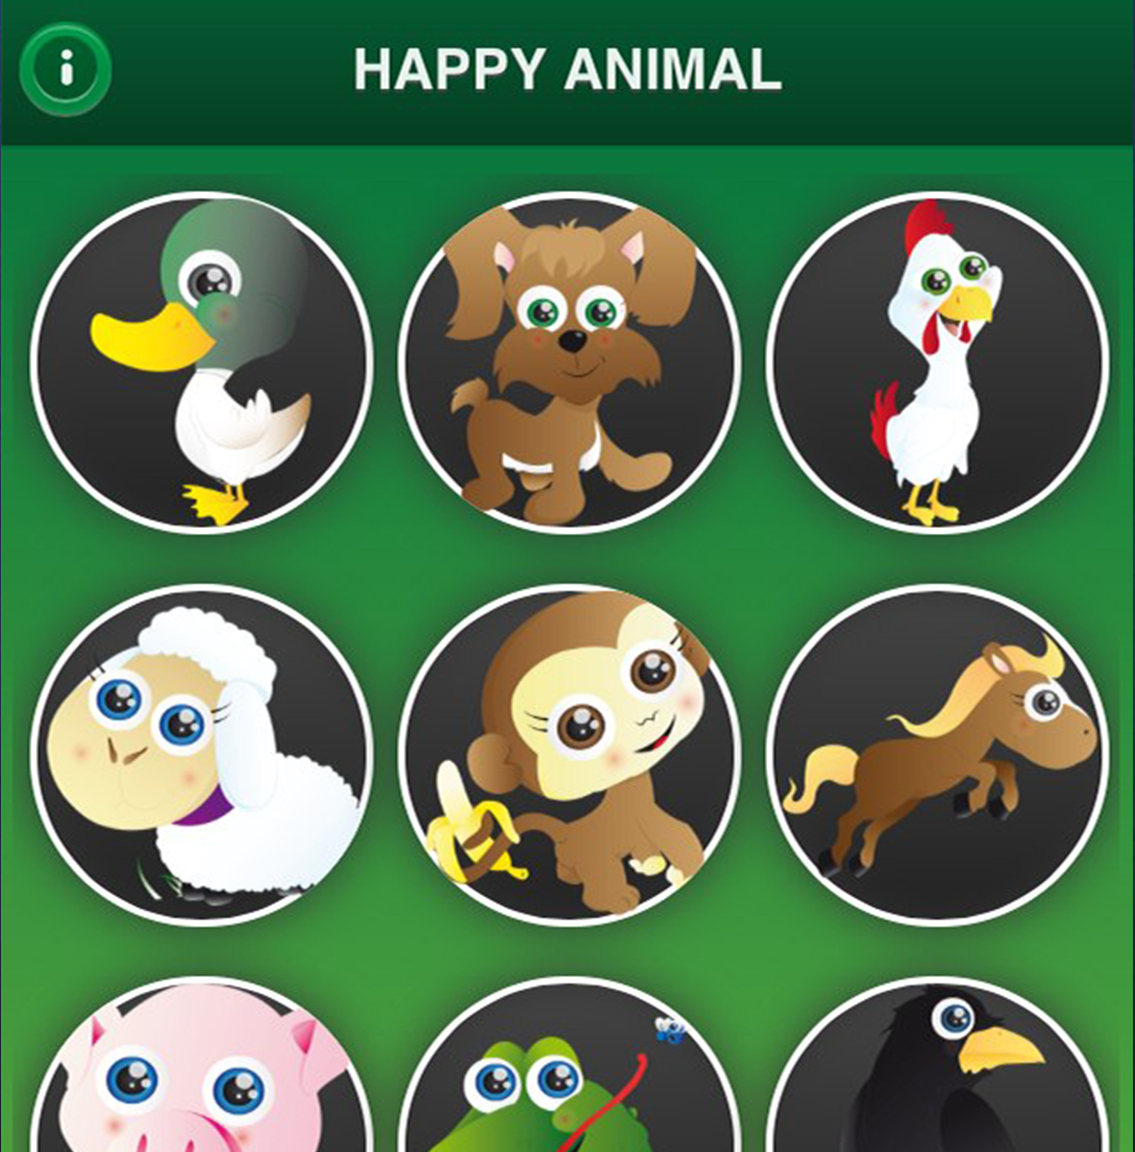 anteprima-slide_happy_animal